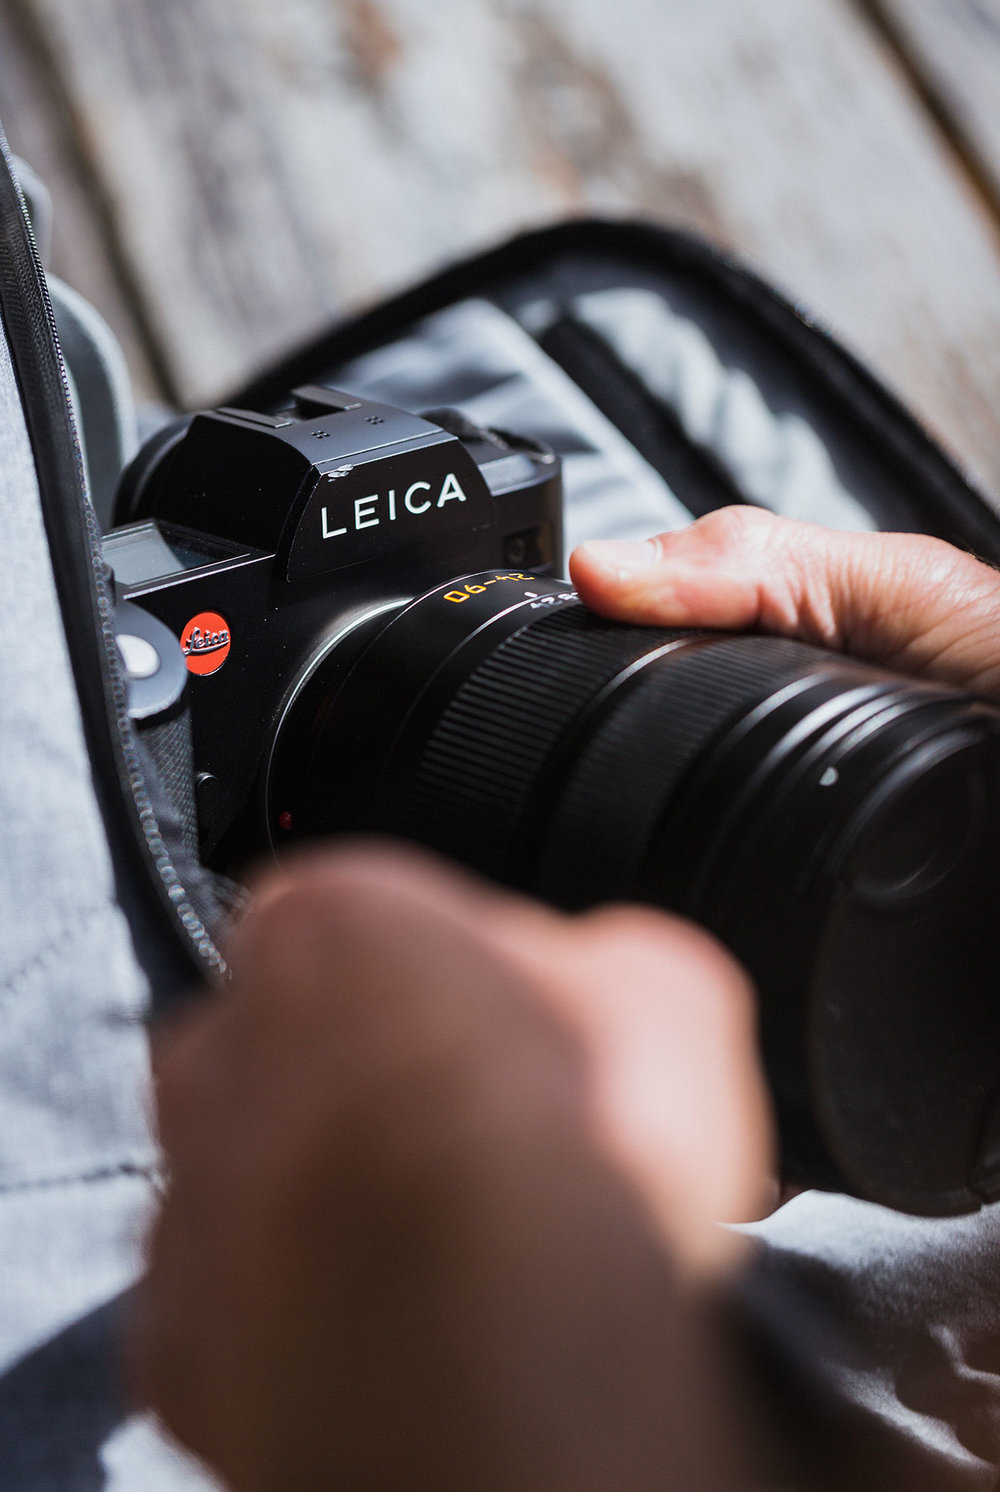 leica-gear-patrol-jeff-j-cp-2018-04.jpg